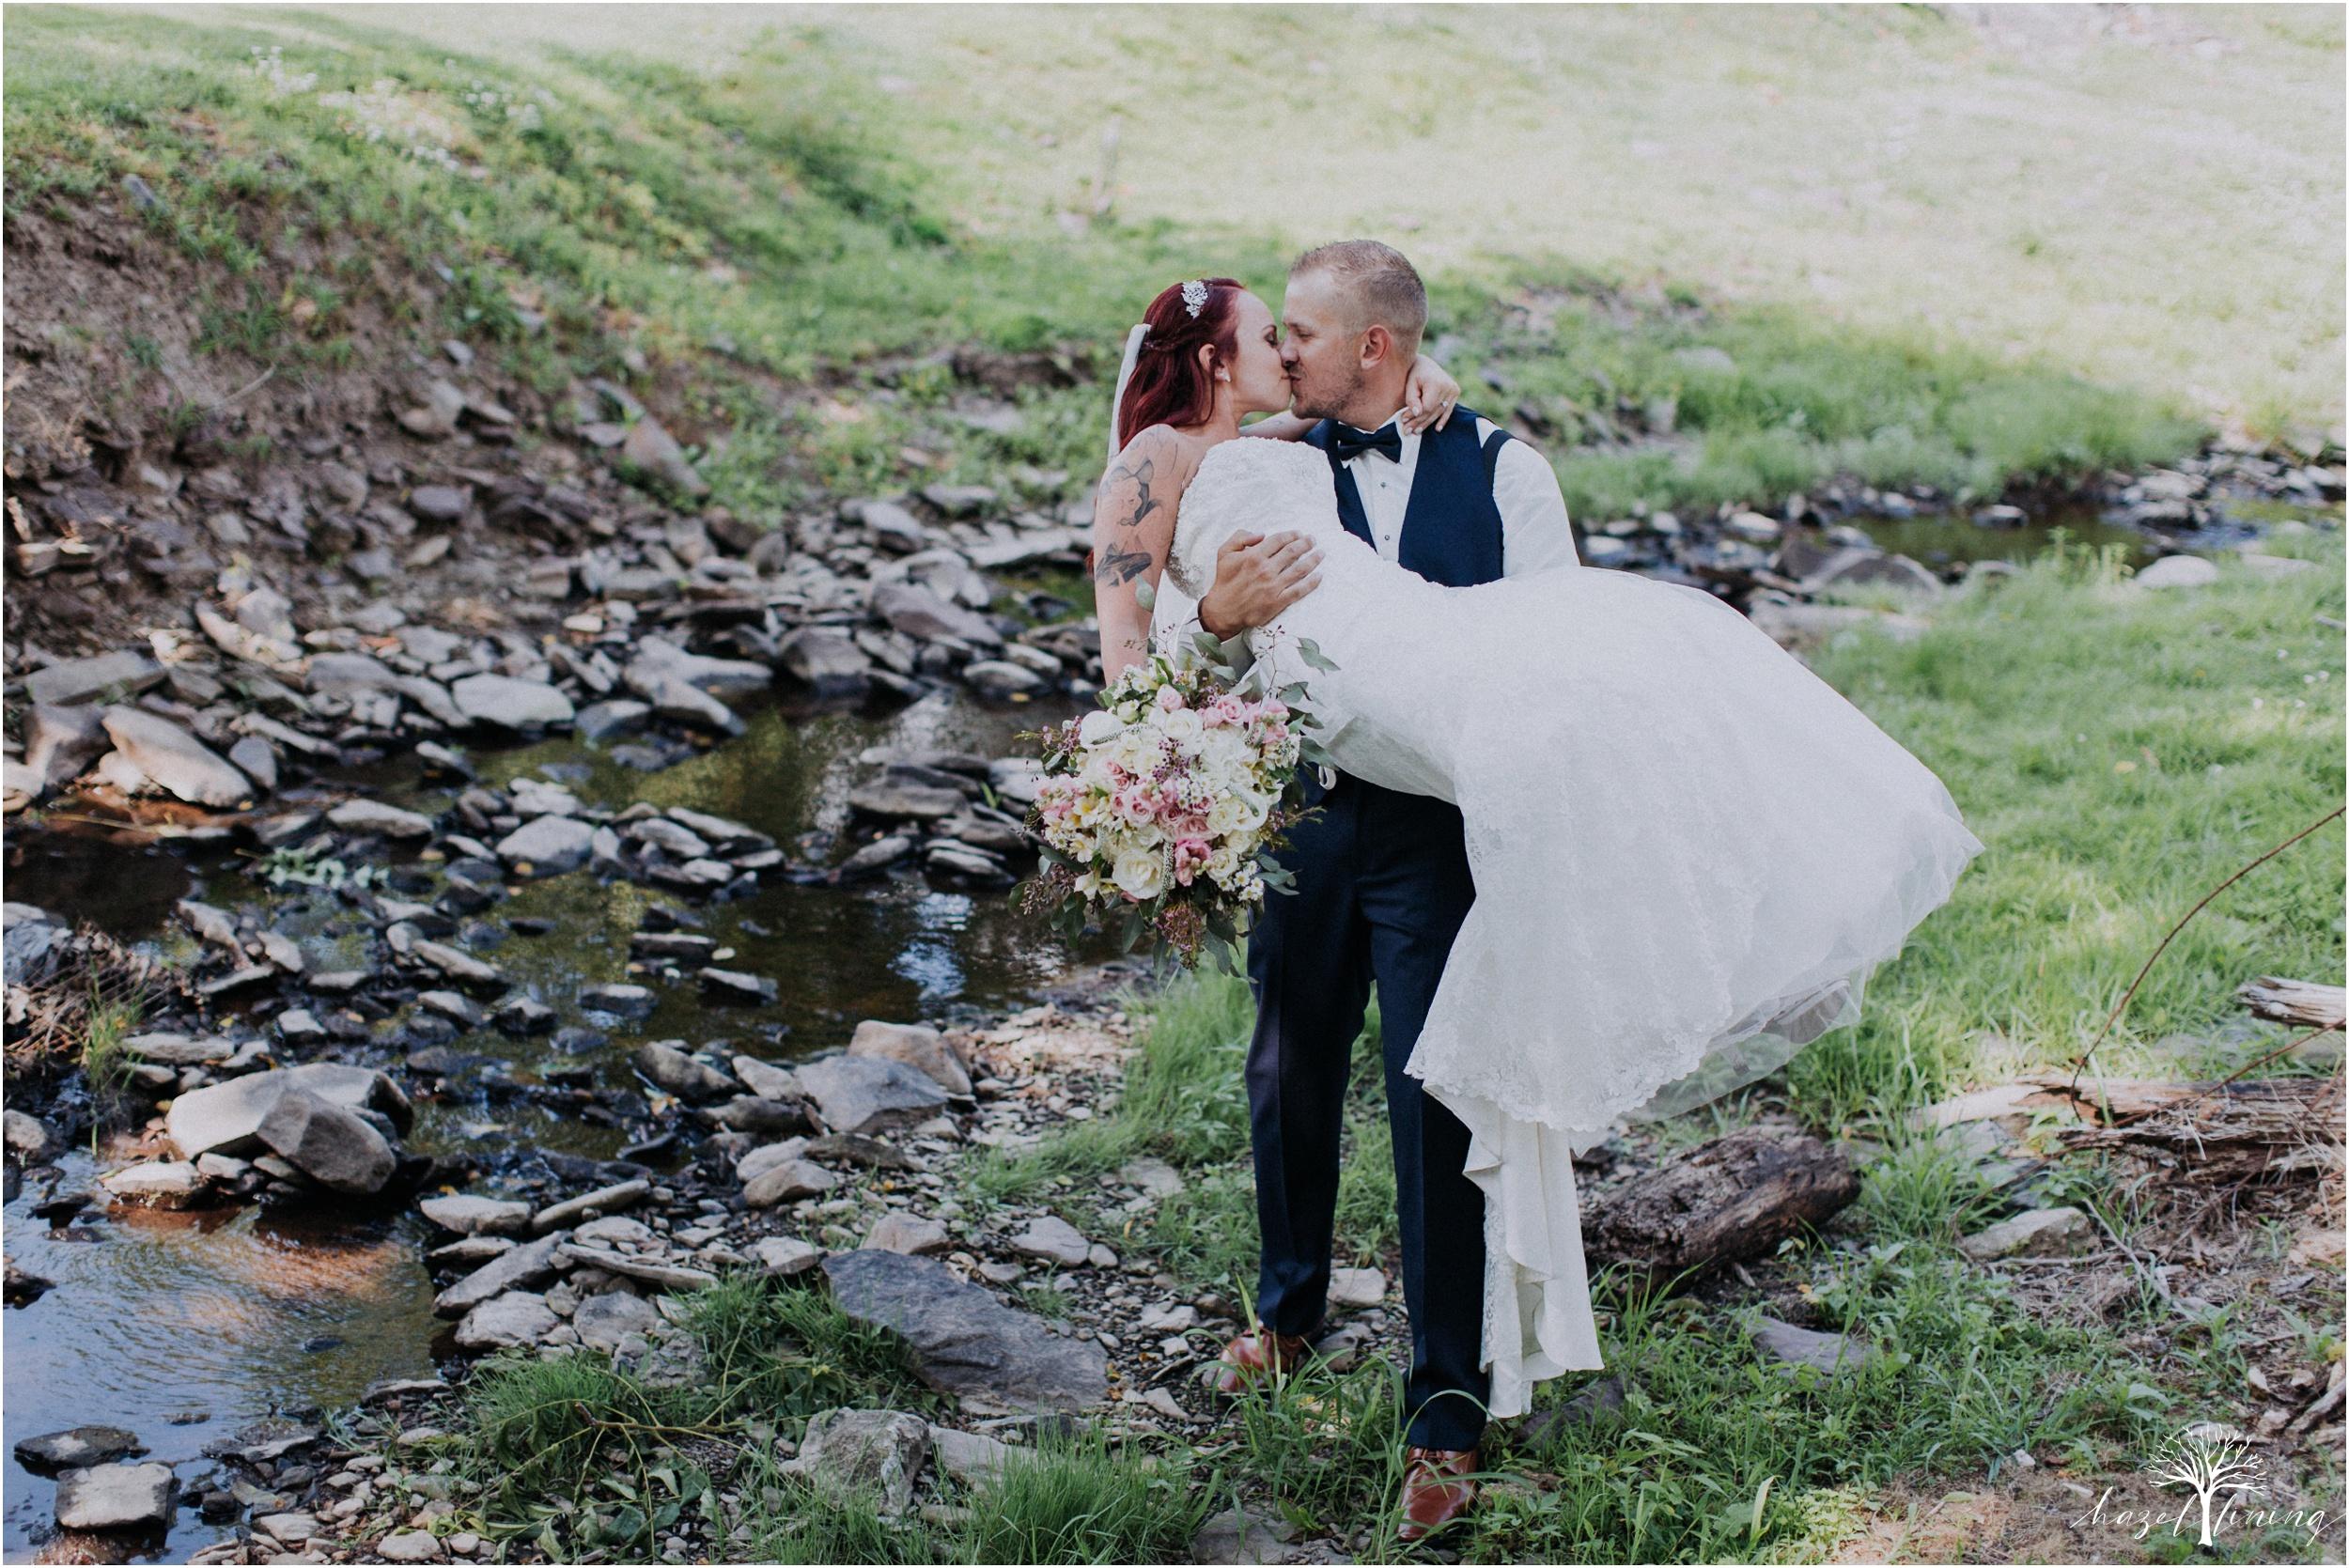 alyssa-james-stiteler-wedding-loft-and-sweet-water-cc-pennsburg-pennsylvania-hazel-lining-travel-wedding-elopement-photography_0095.jpg